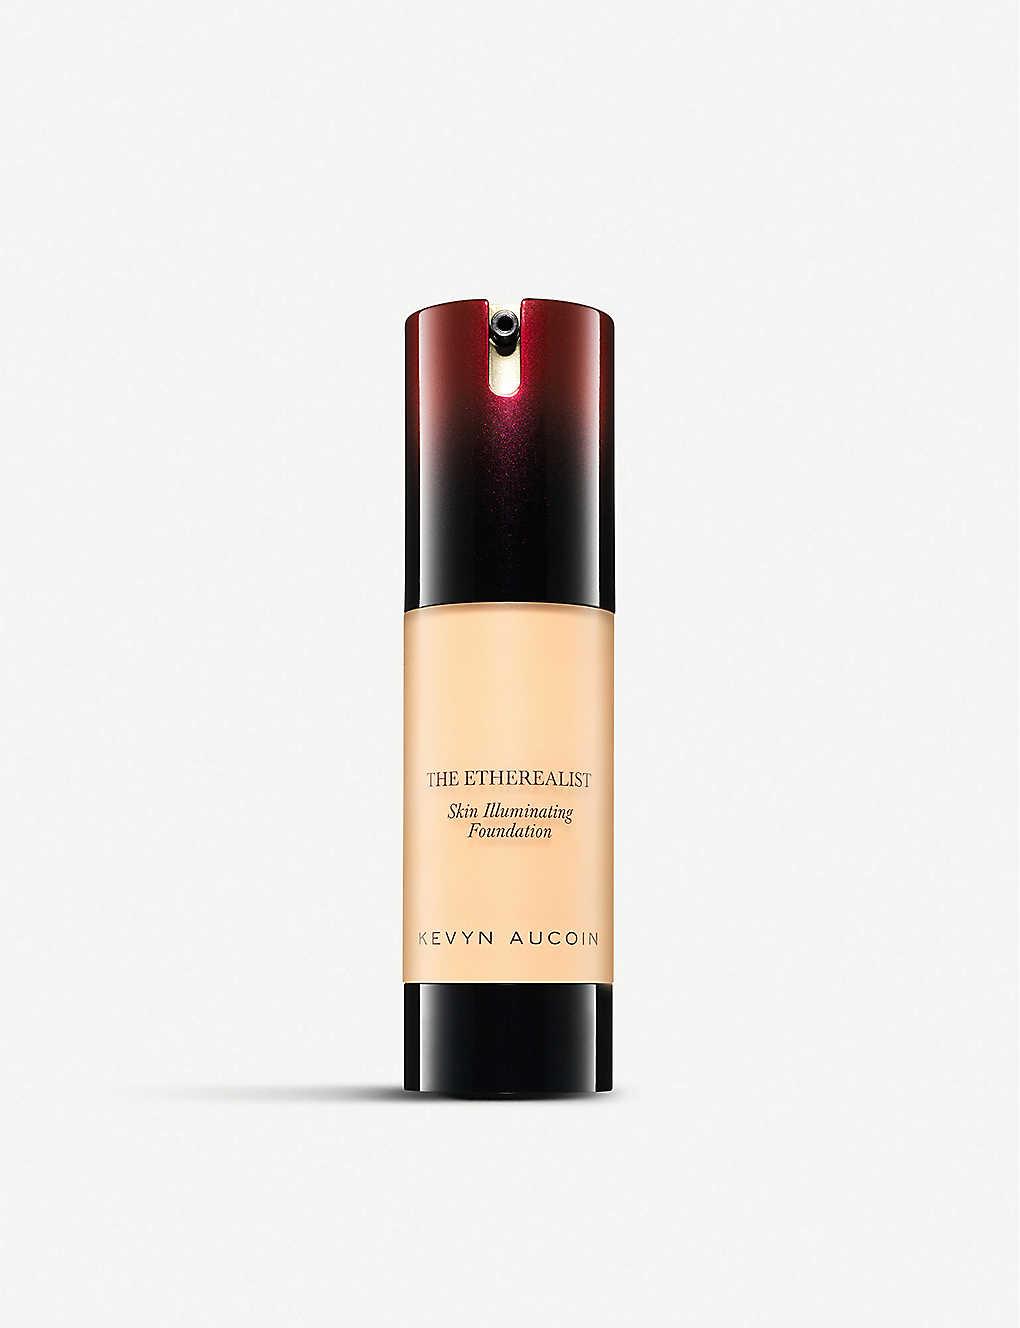 KEVYN AUCOIN: The Etherealist Skin Illuminating Foundation 28ml